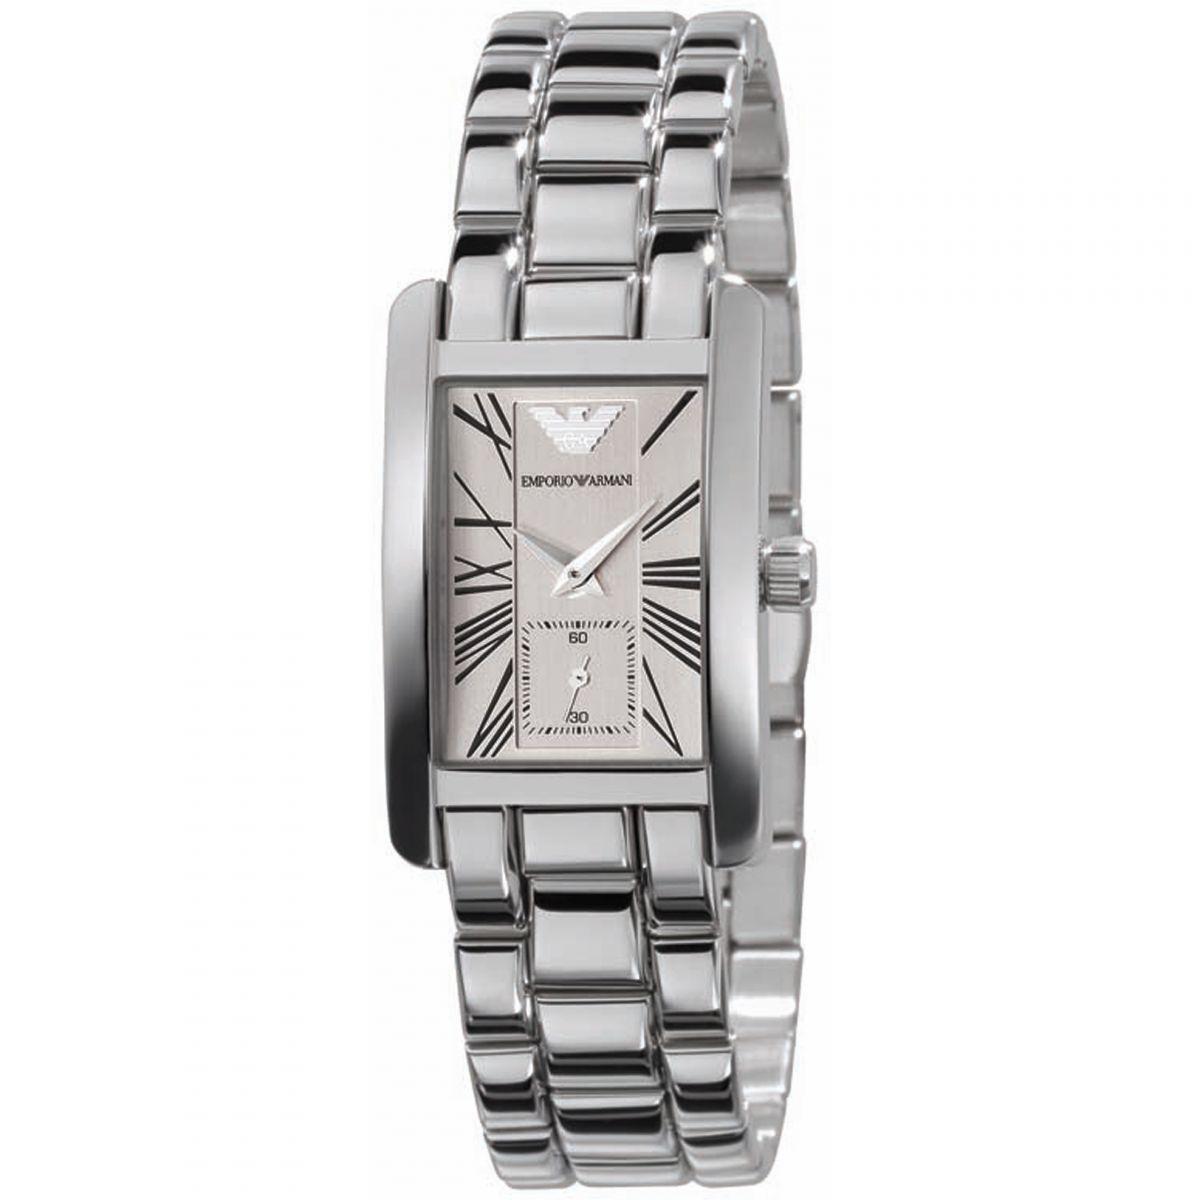 Emporio Armani Classic Ladies Watch | Chronograph White Dial | Bracelet Strap | AR0176